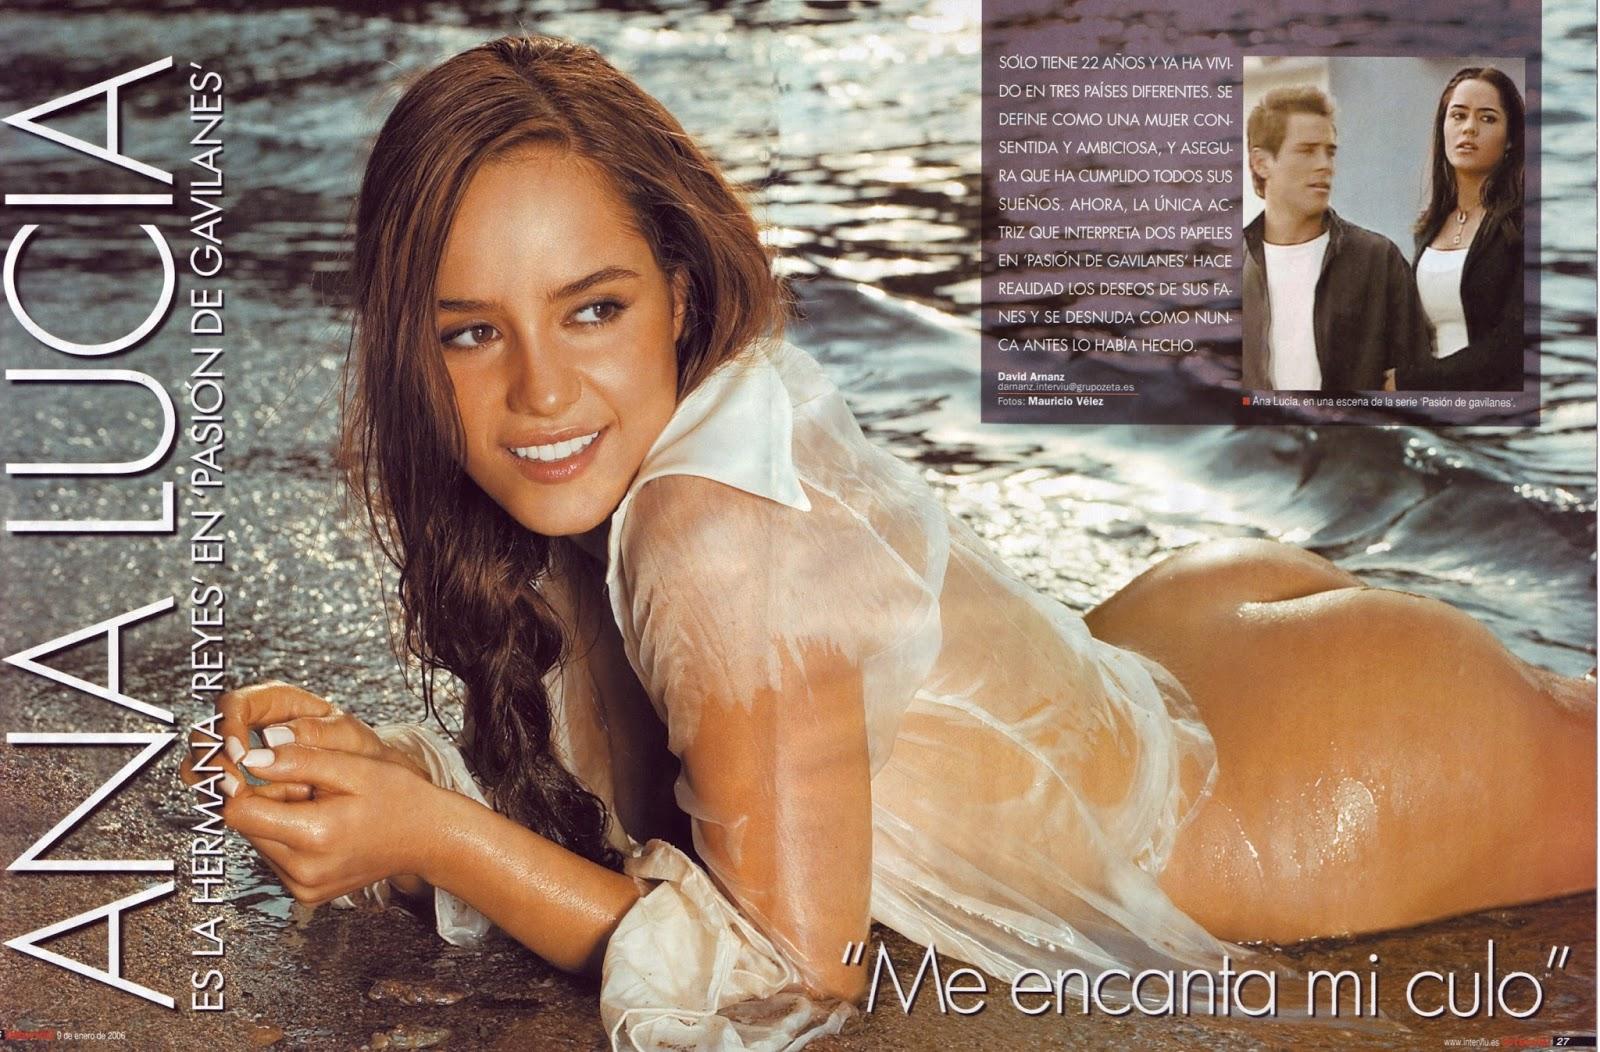 Ana Lucia Desnuda ana lucia dominguez ass pictures | hot sexy ass